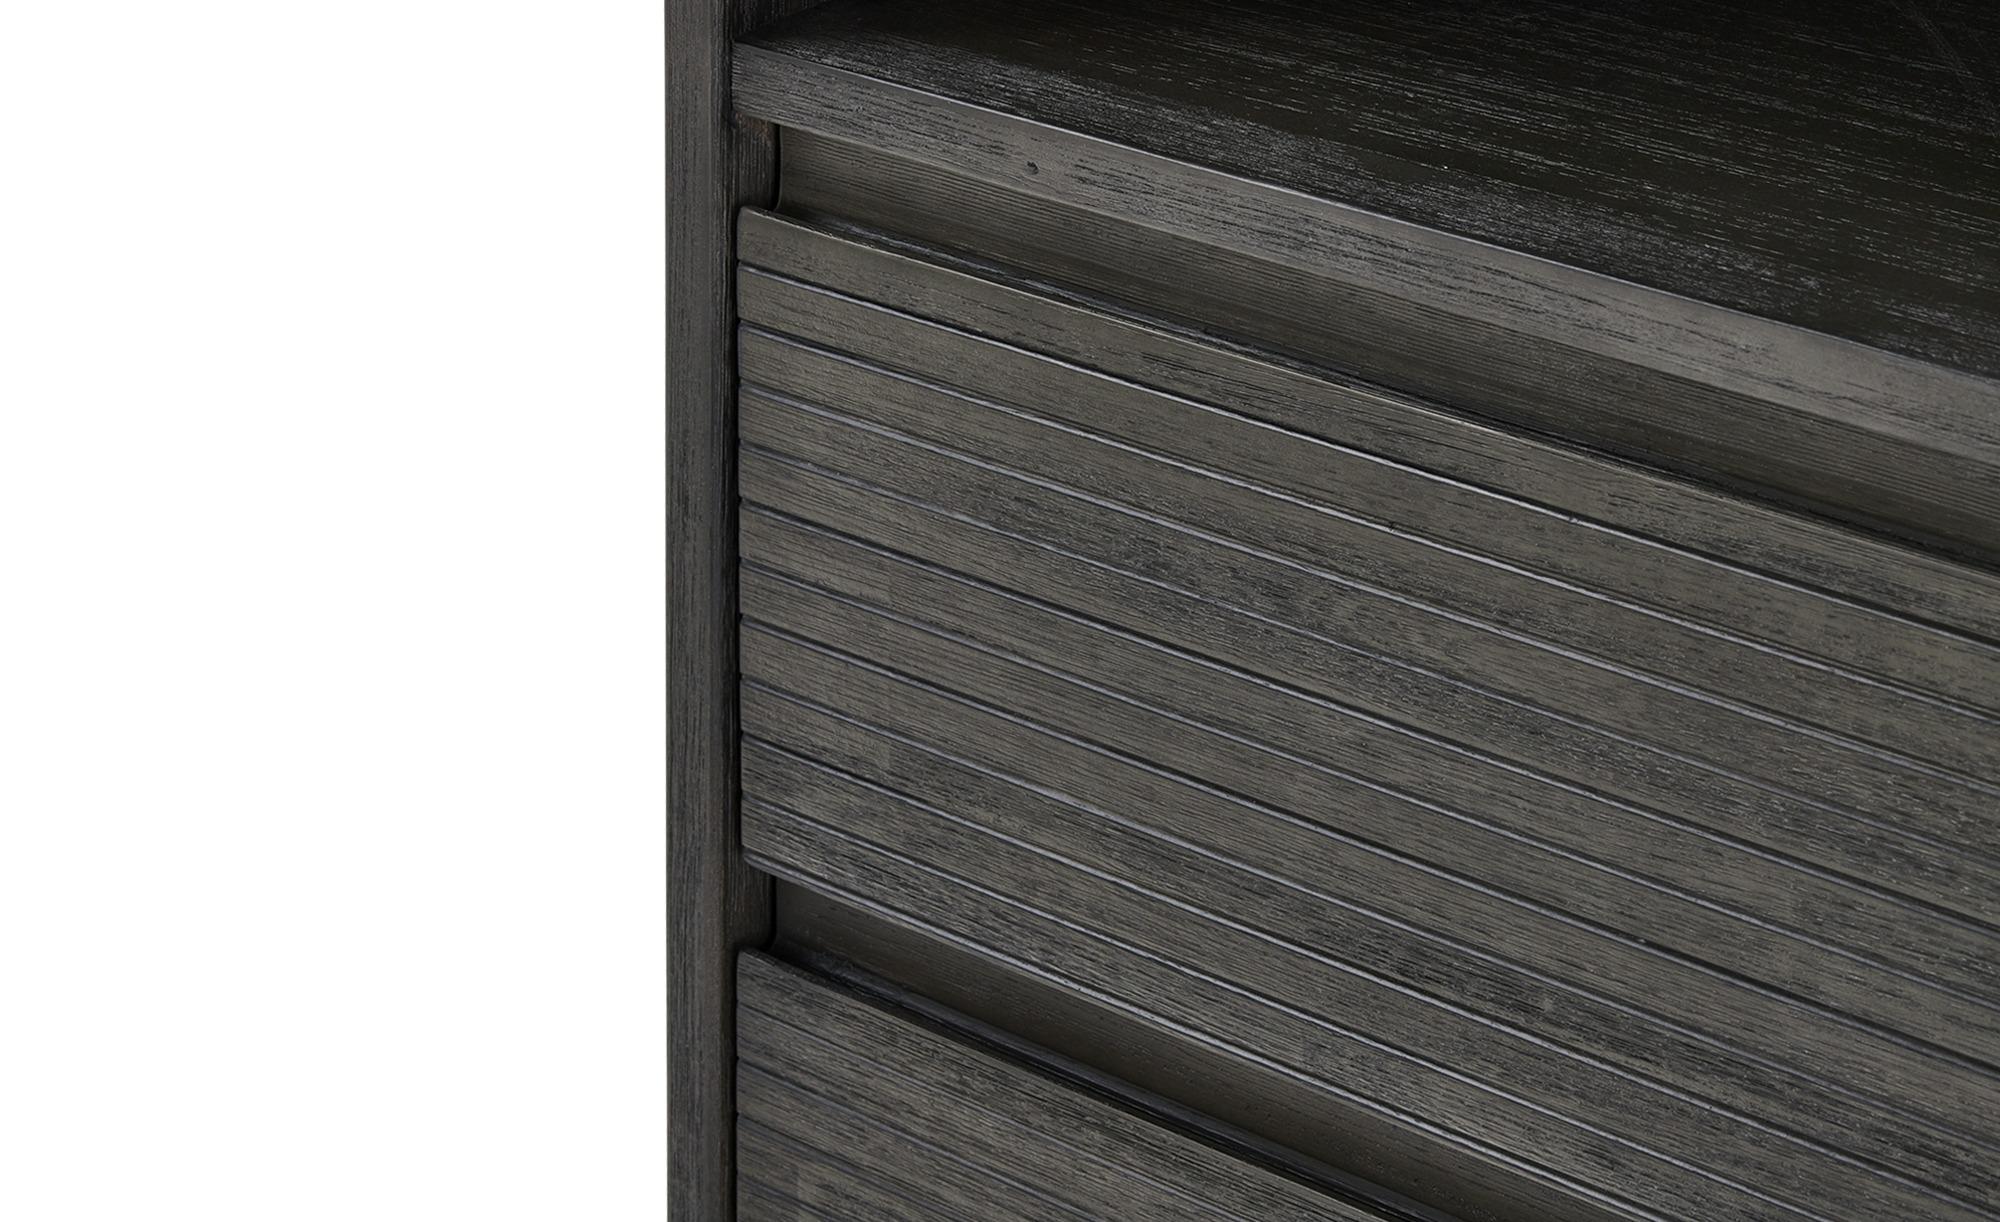 Regal  Campana ¦ grau ¦ Maße (cm): B: 70 H: 170 T: 35 Regale > Bücherregale - Höffner | Wohnzimmer > Regale | Grau | Massivholz | Möbel Höffner DE